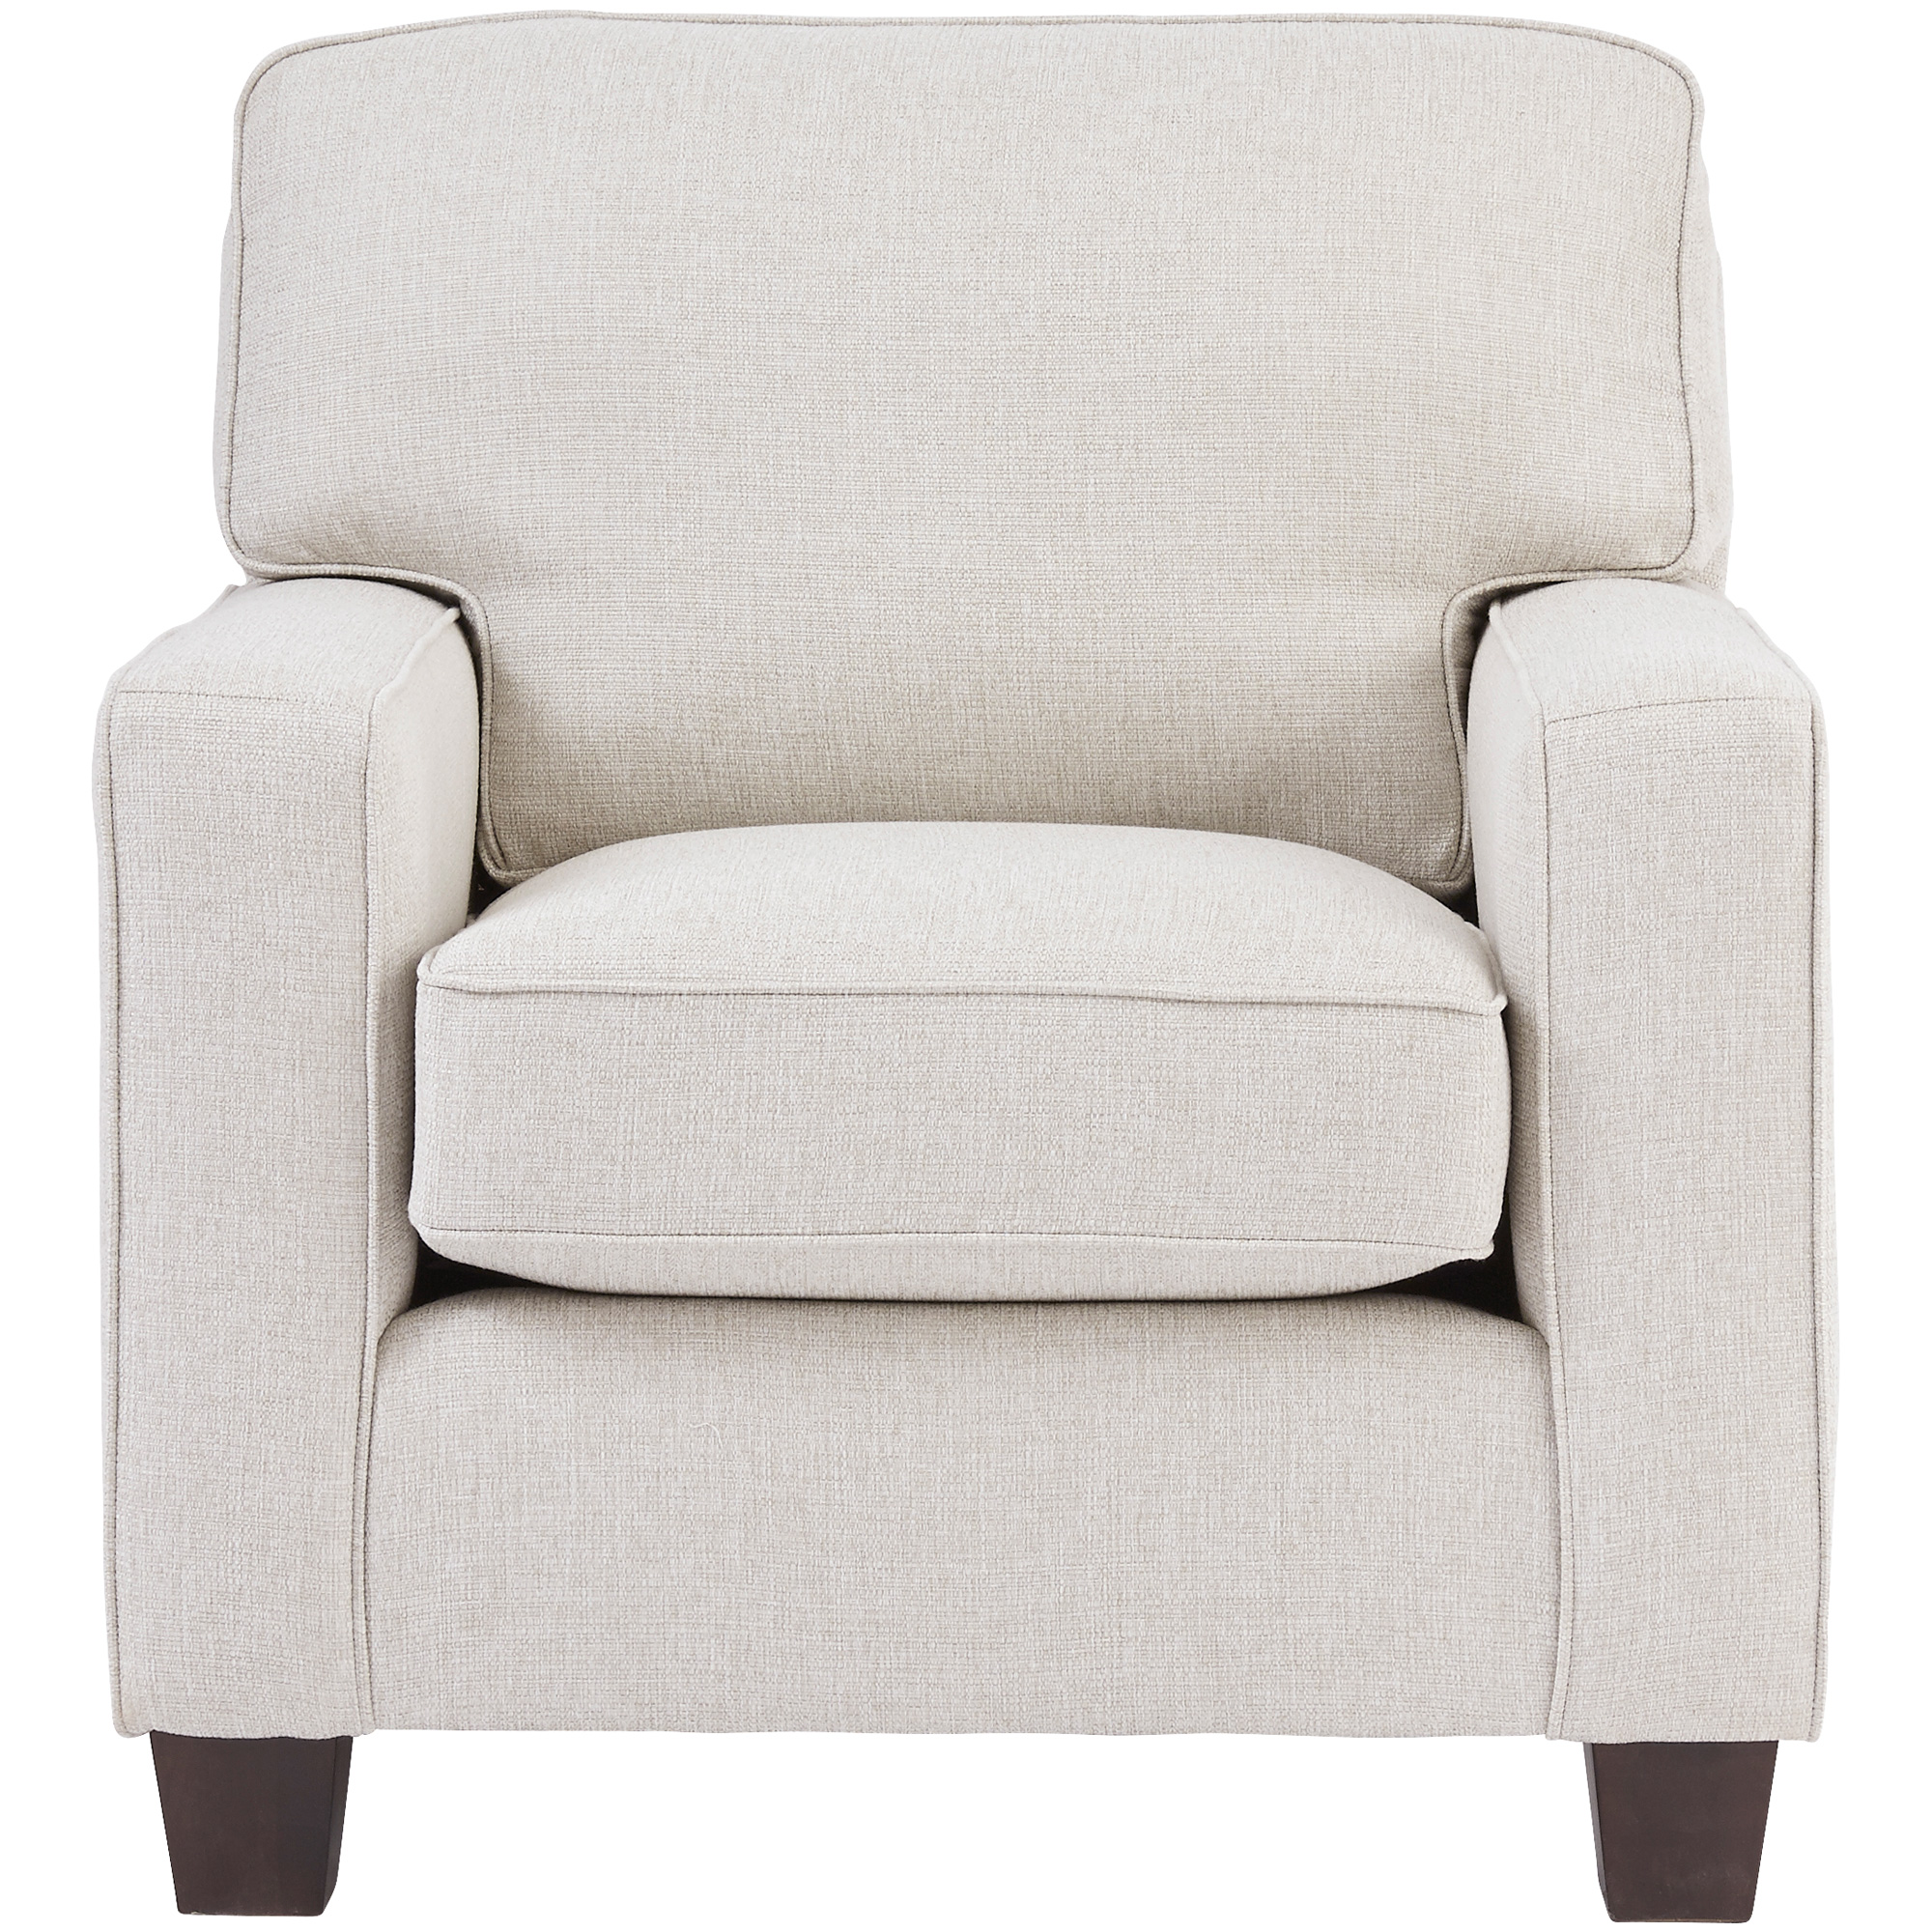 Best Home Furnishings | Annabel Cream Chair